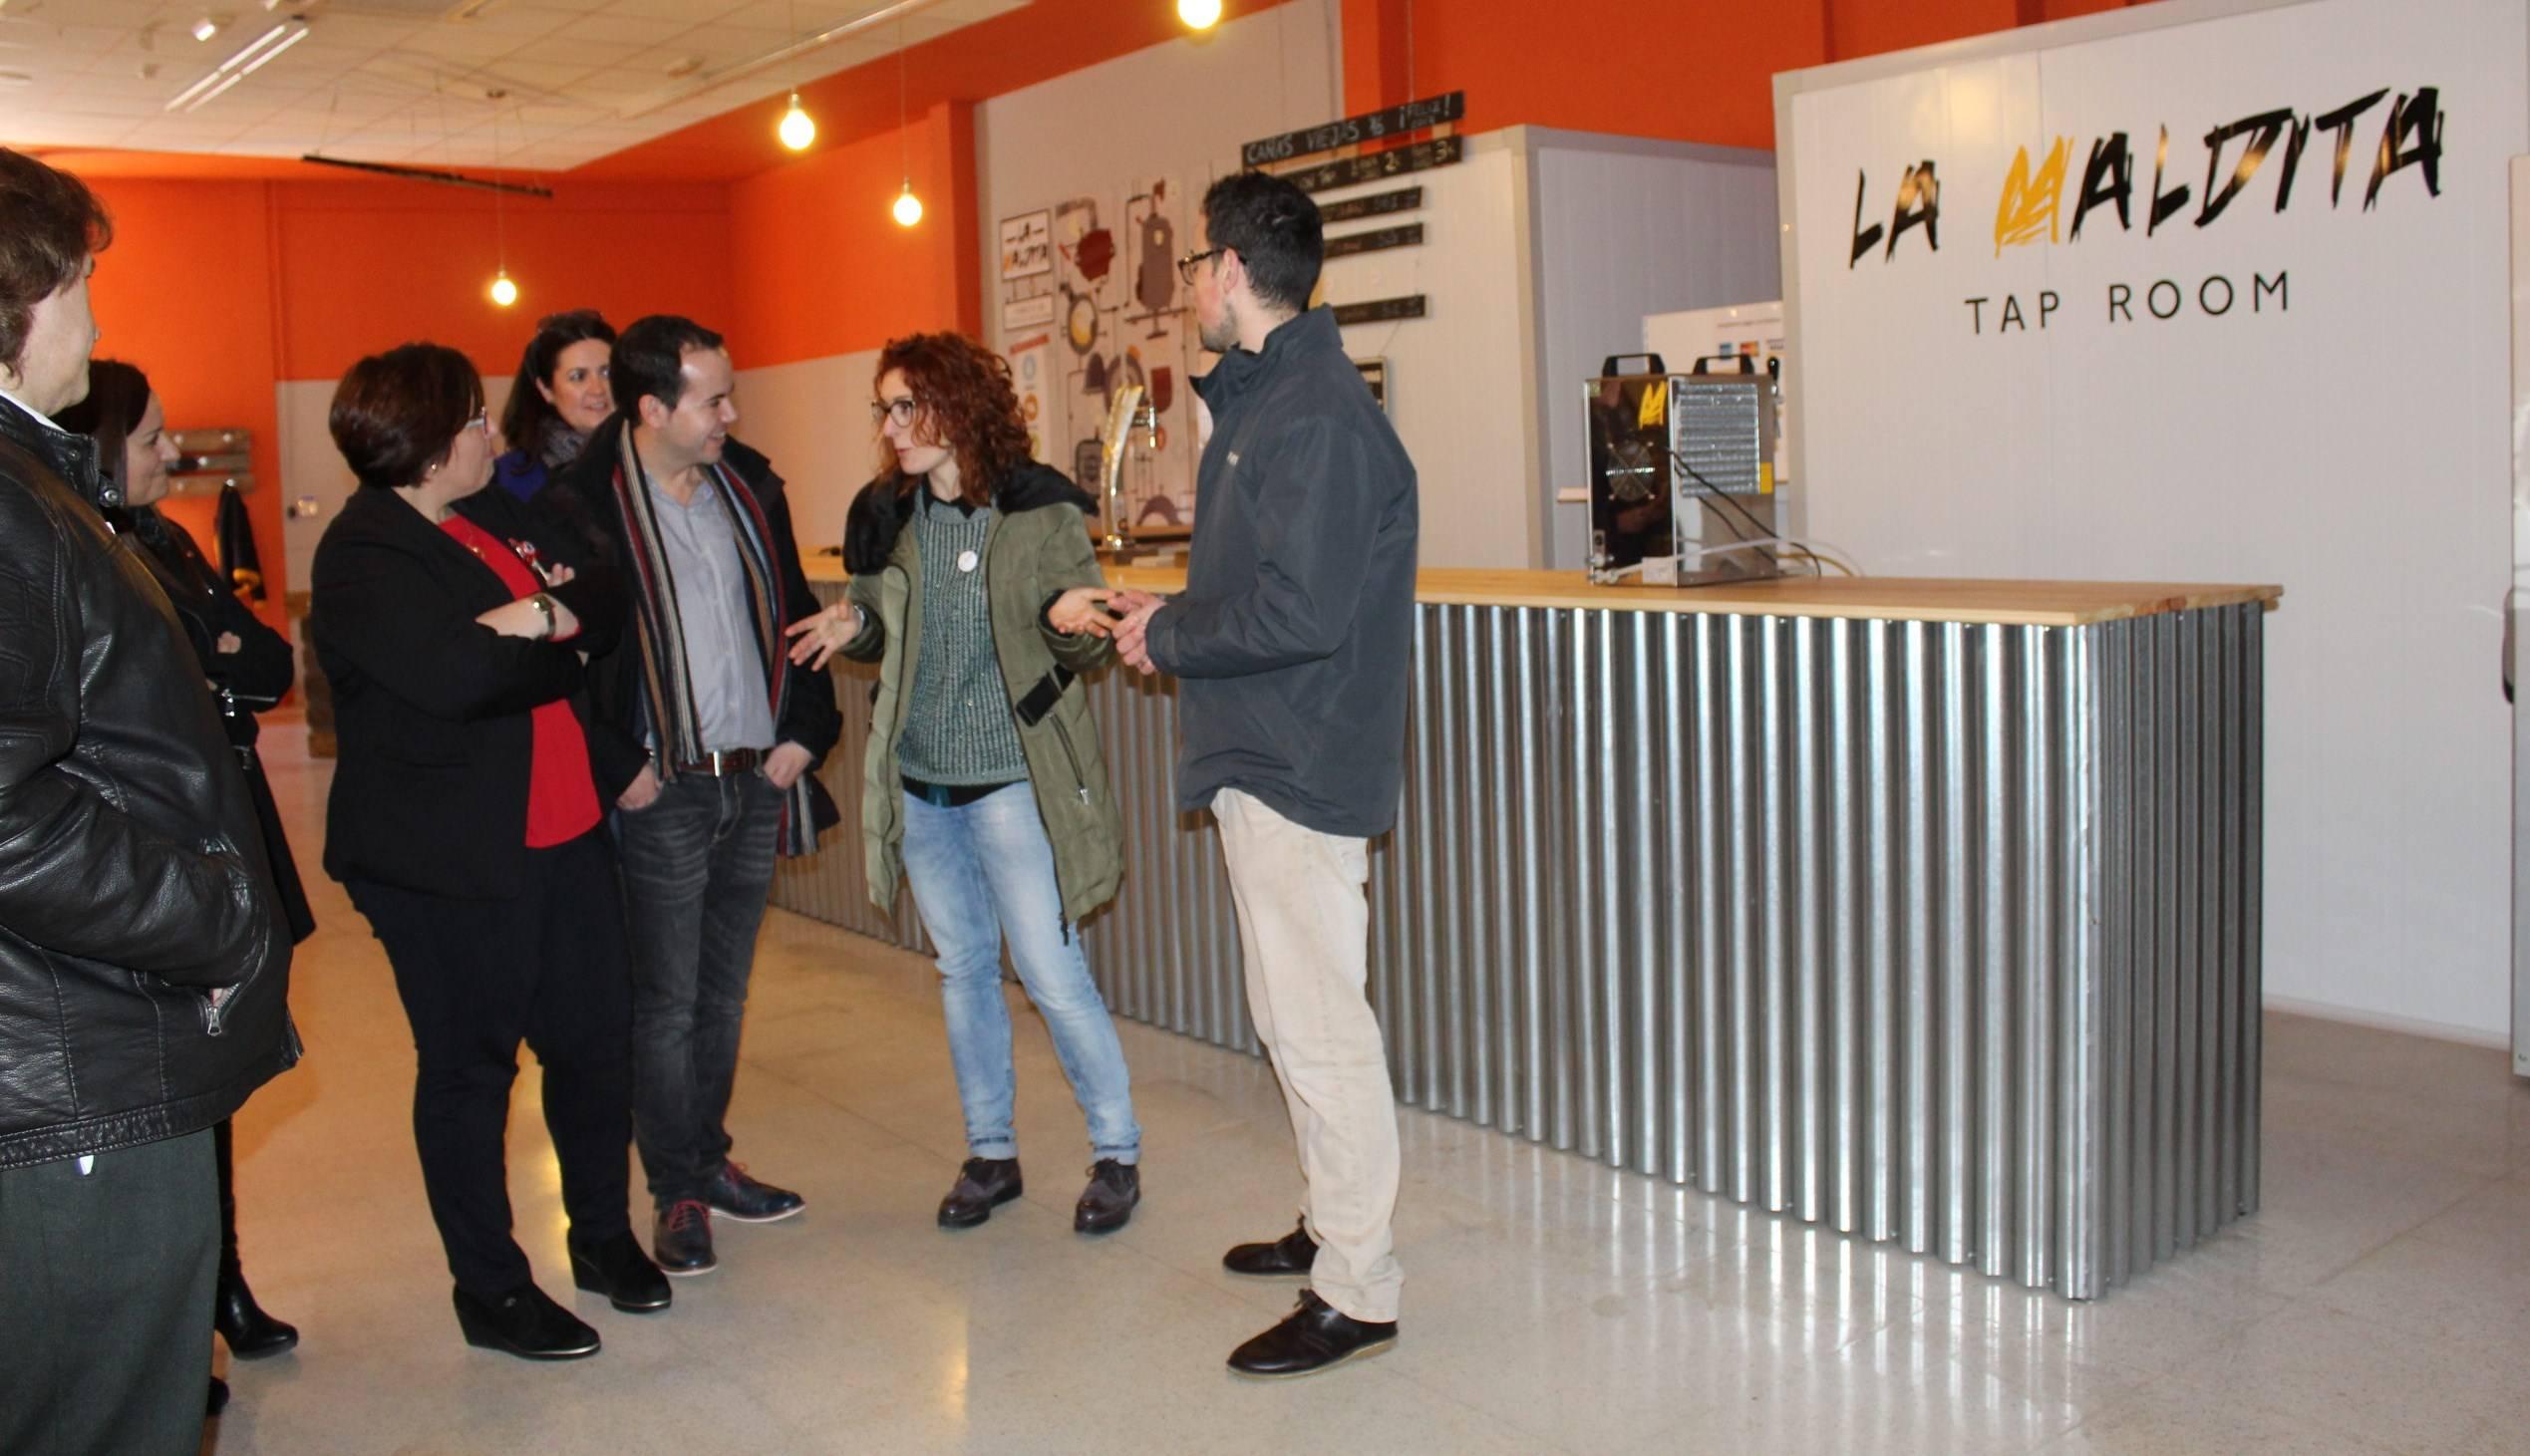 Carmen Olmedo visita cerveza La Maldita 1 - Olmedo visita La Maldita y hace balance del empleo regional